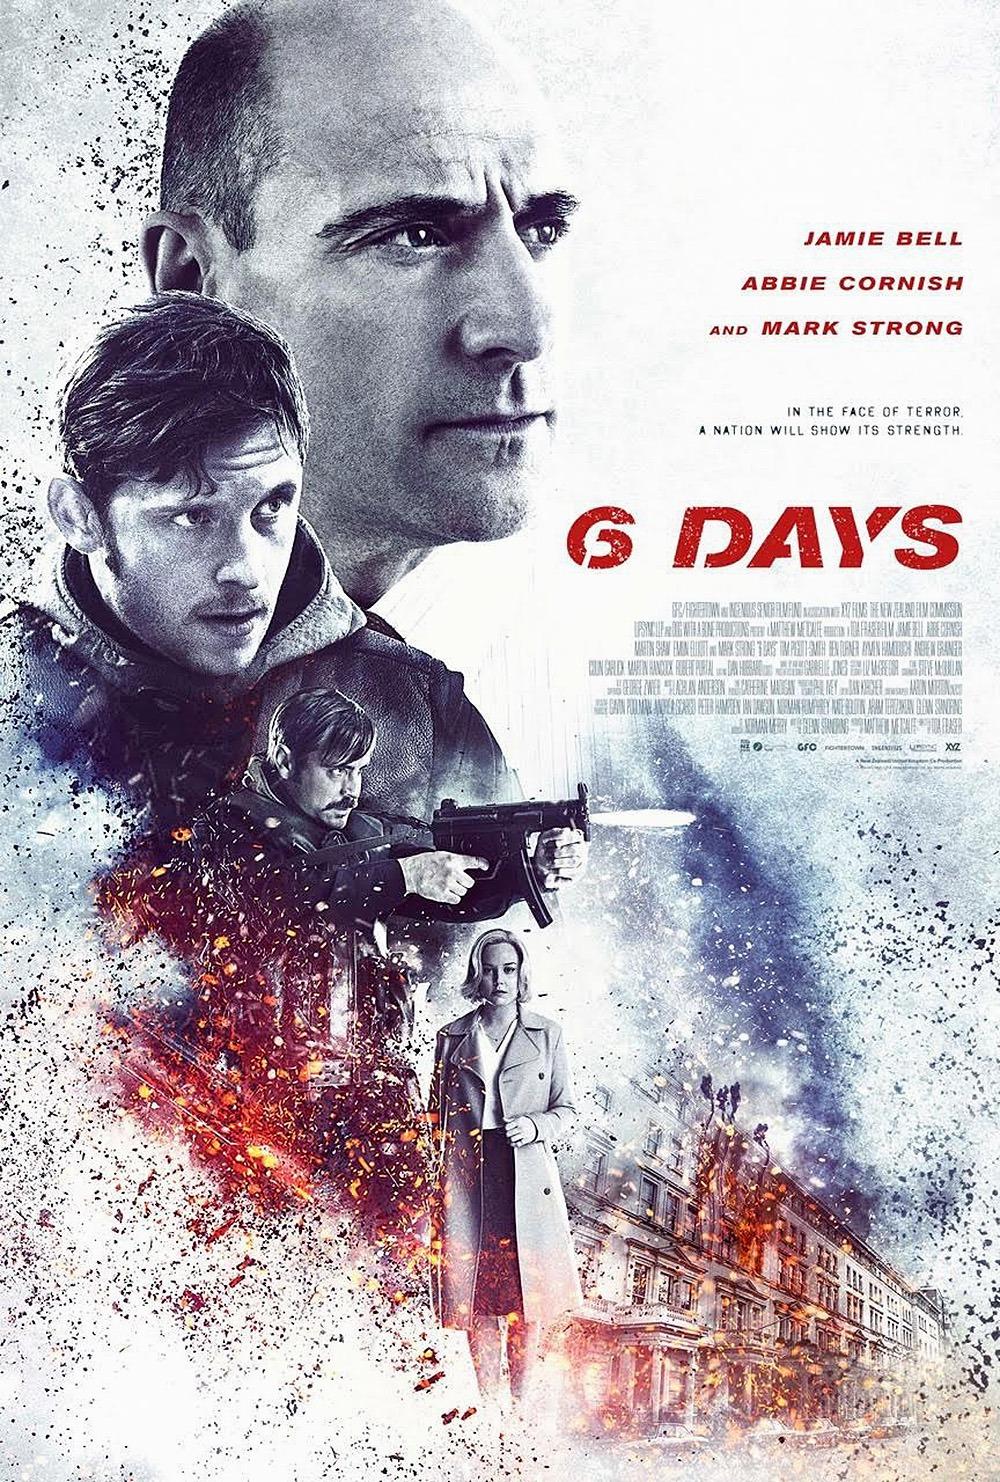 6 dni film recenzja jamie bell mark strong abbie cornish